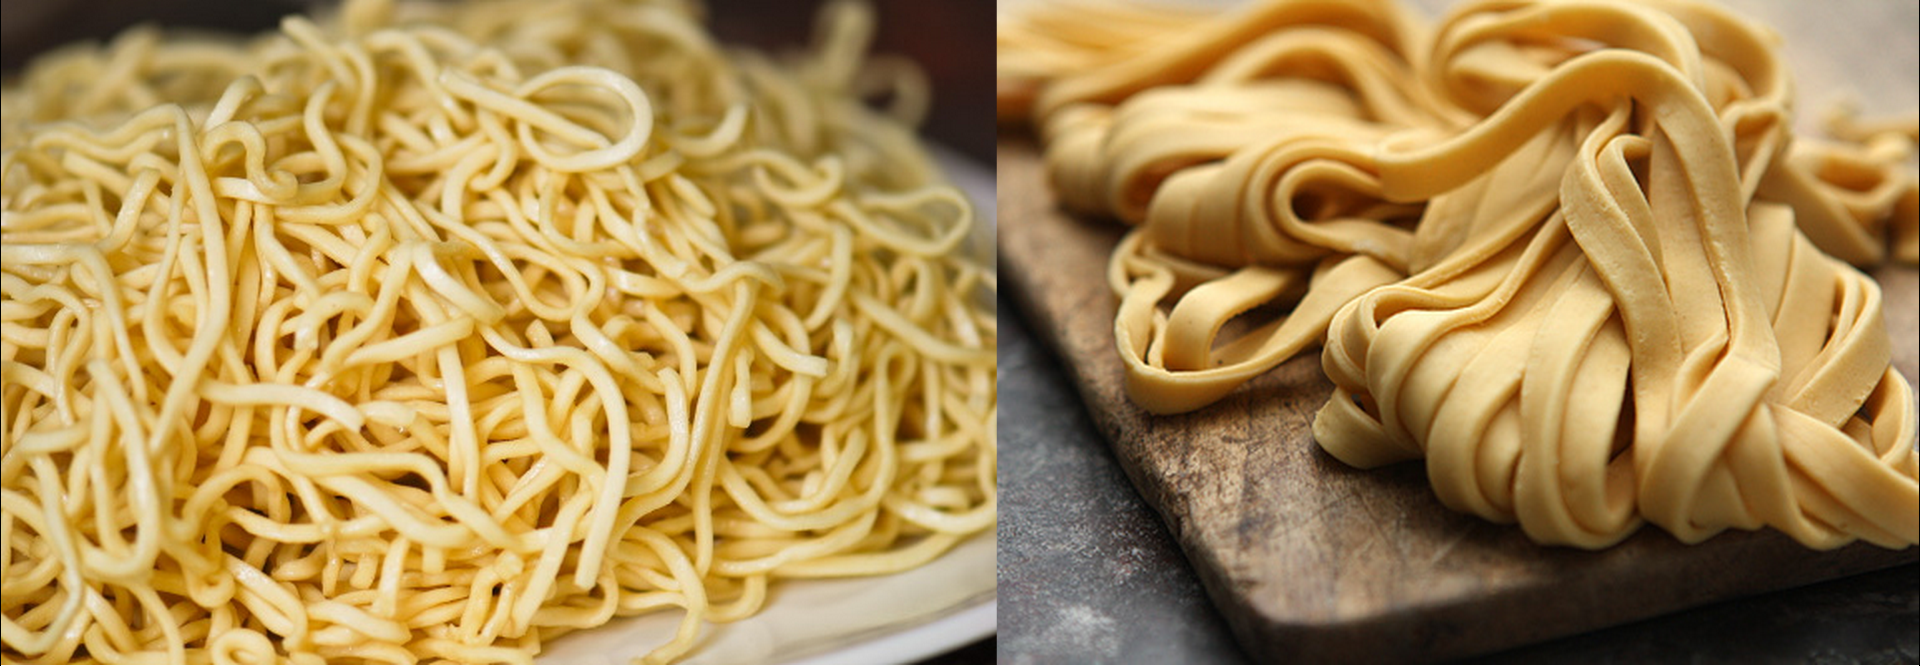 Egg Noodles Vs Pasta